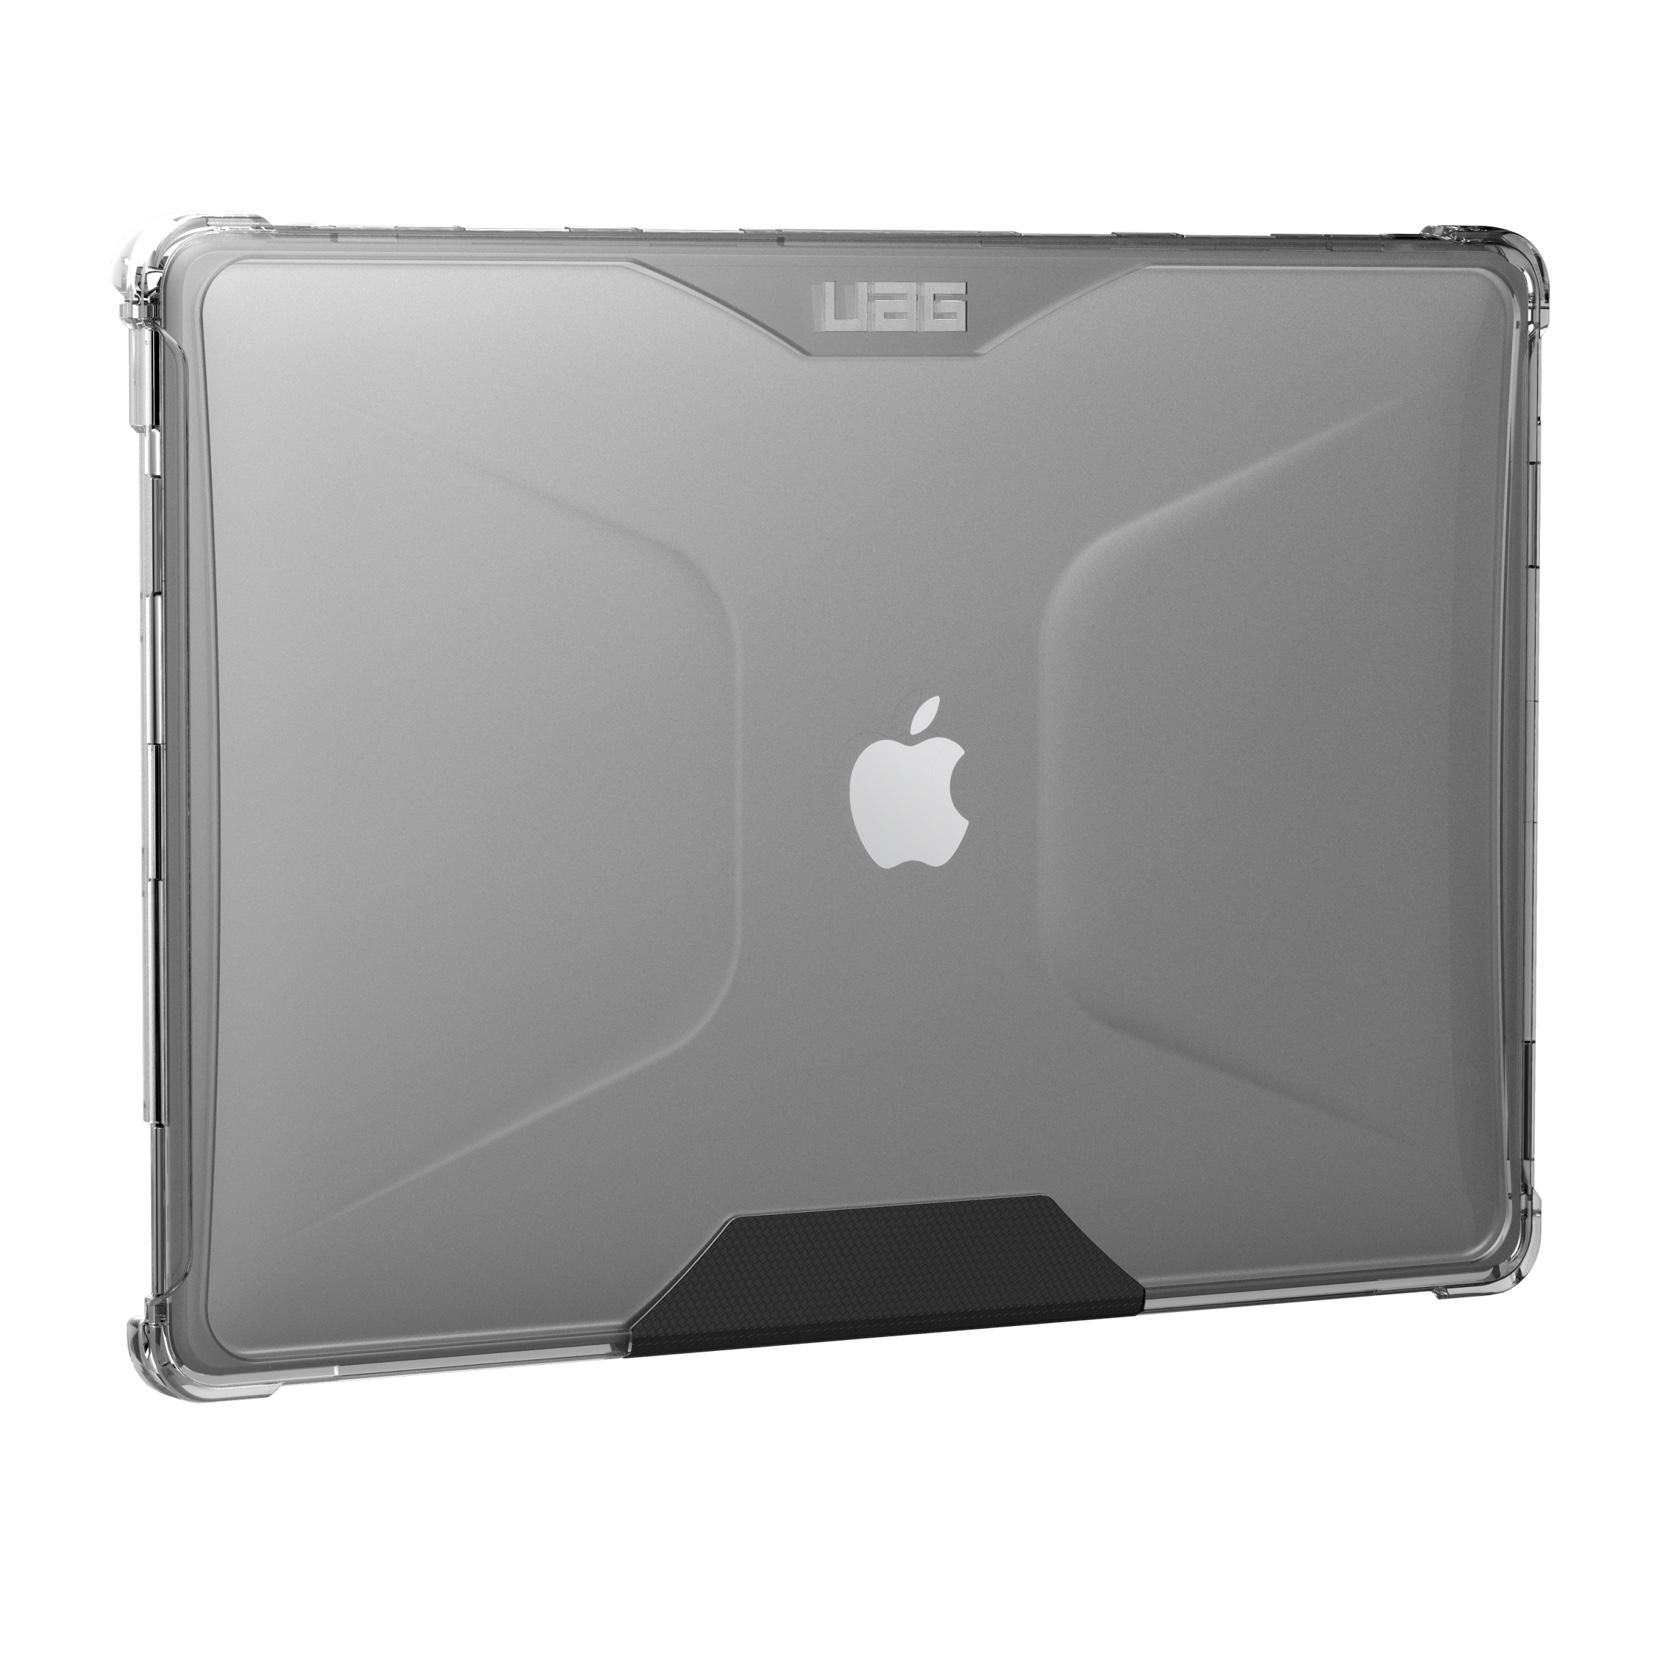 MacBook PRO 16 Coque Professionnelle Plyo Anti chocs avec Aeration Transparente